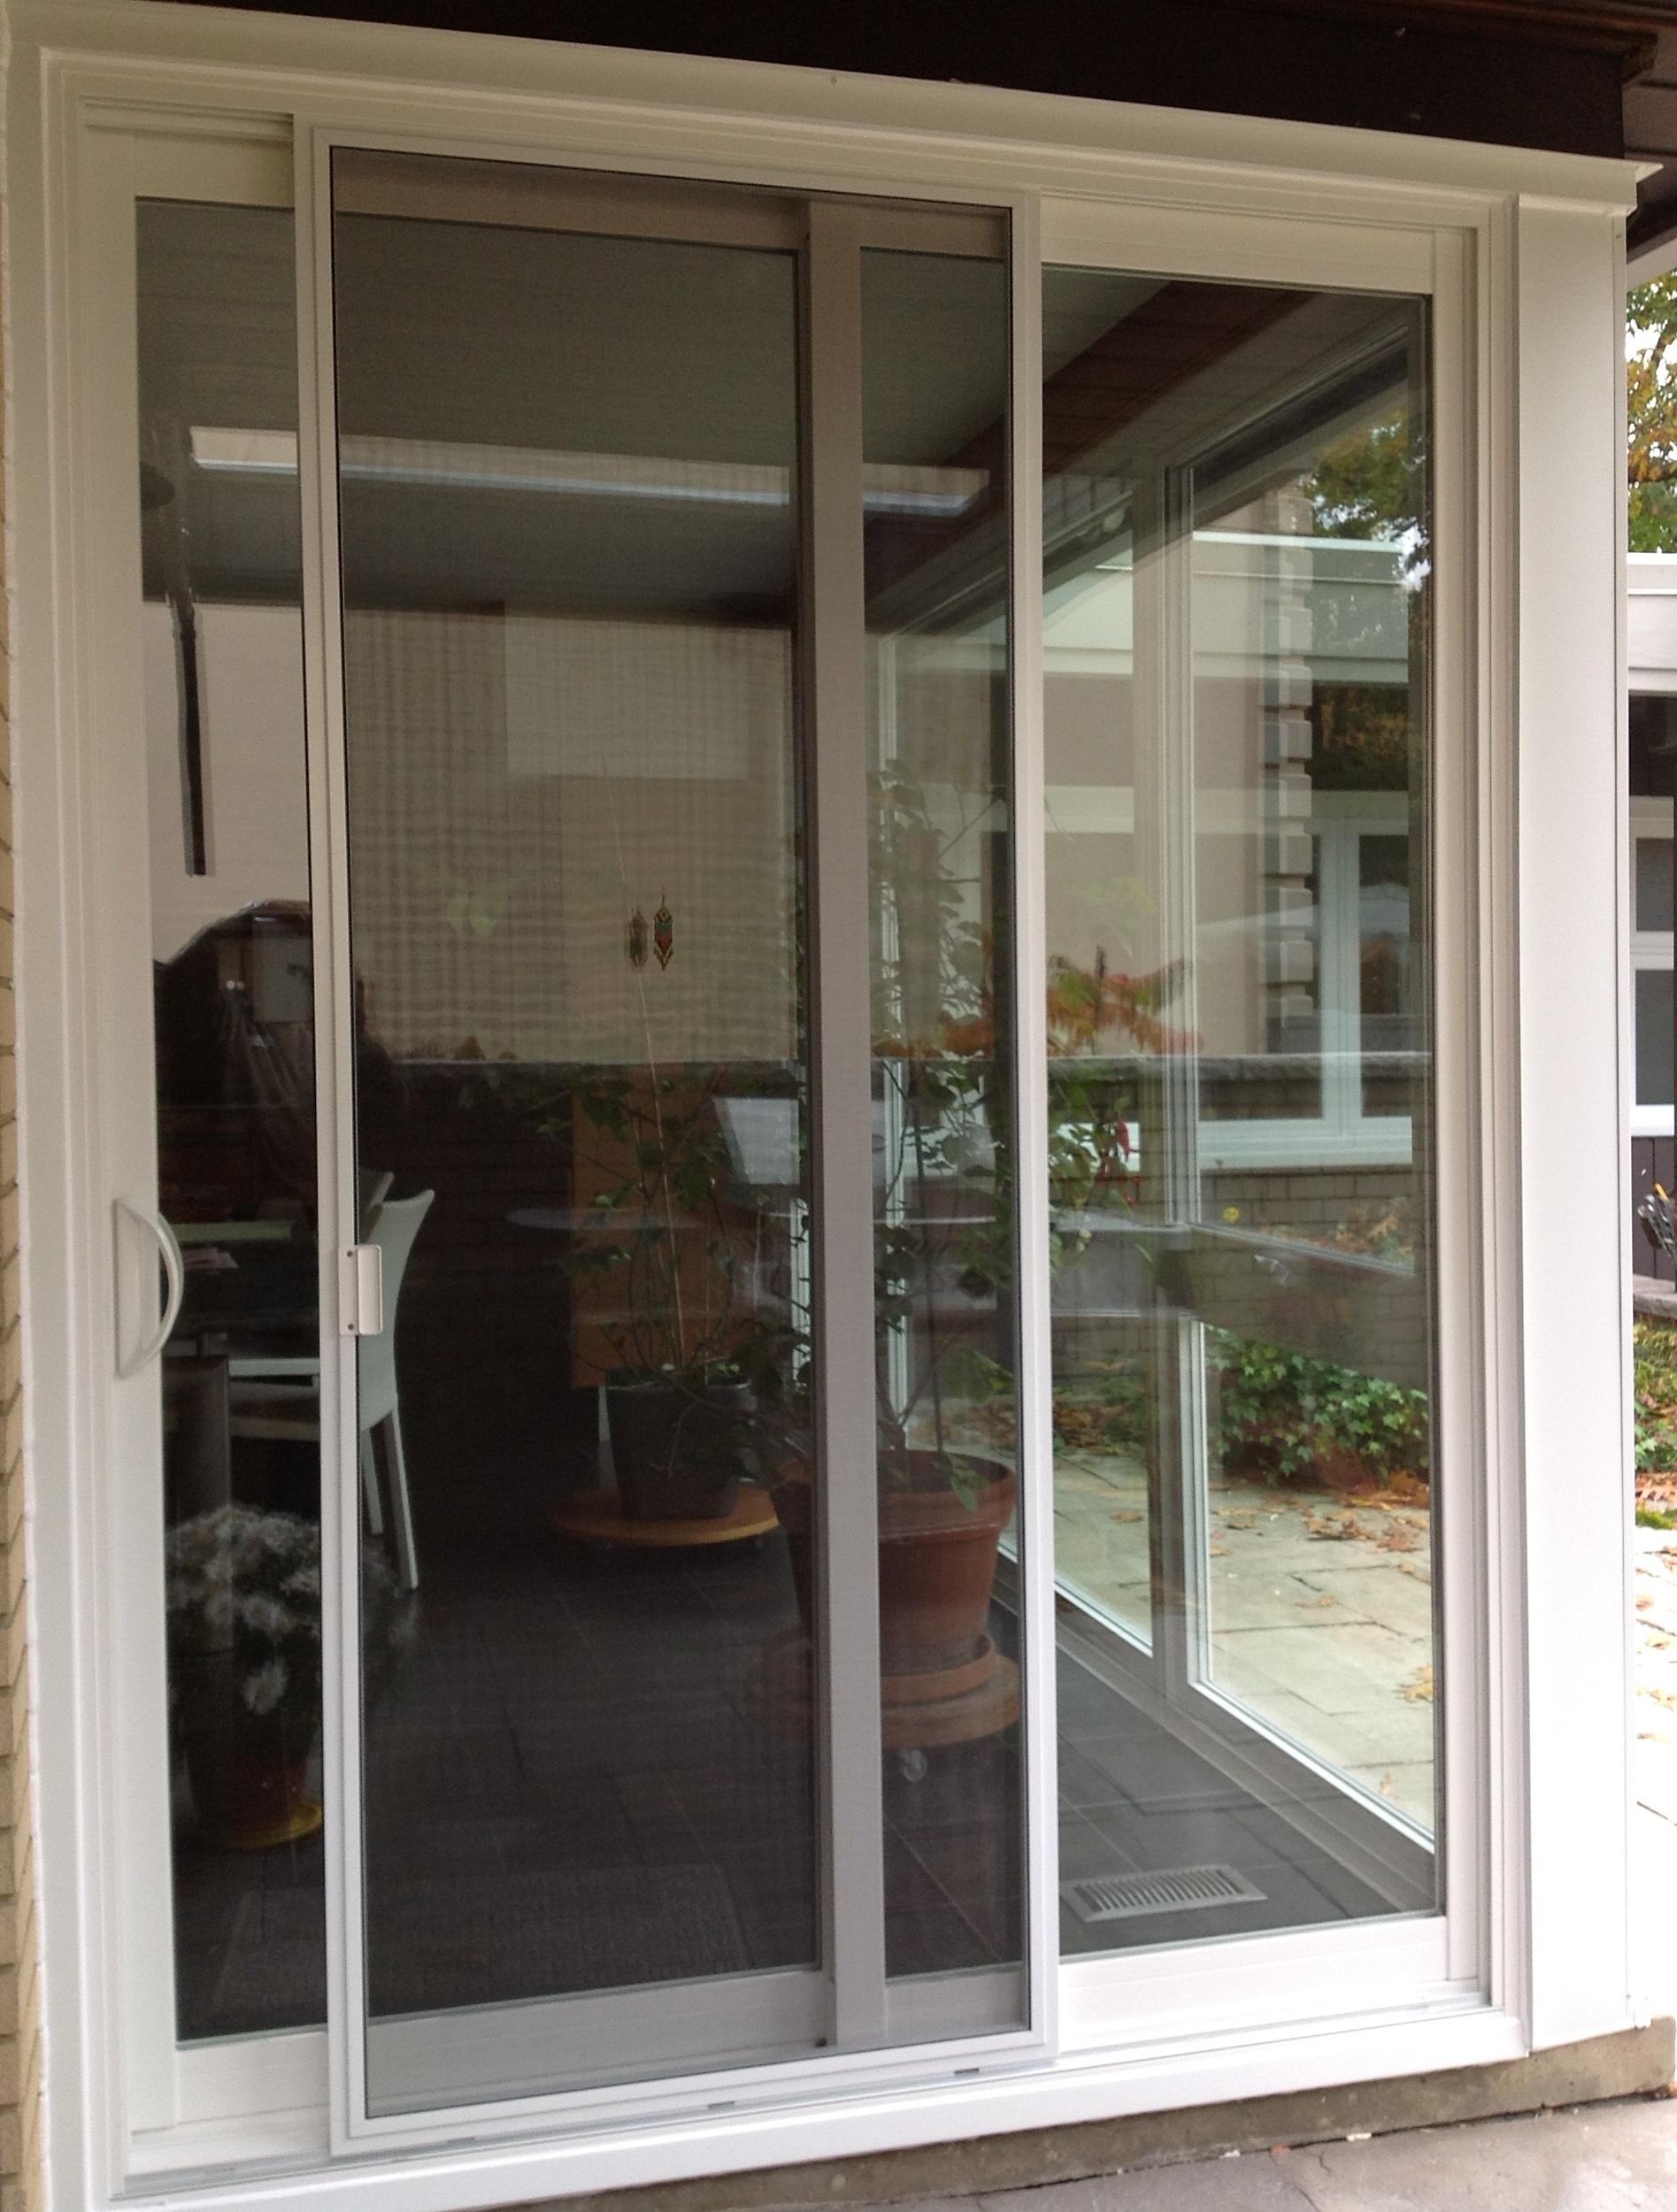 Screens For Sliding Patio Doors1895 X 2500